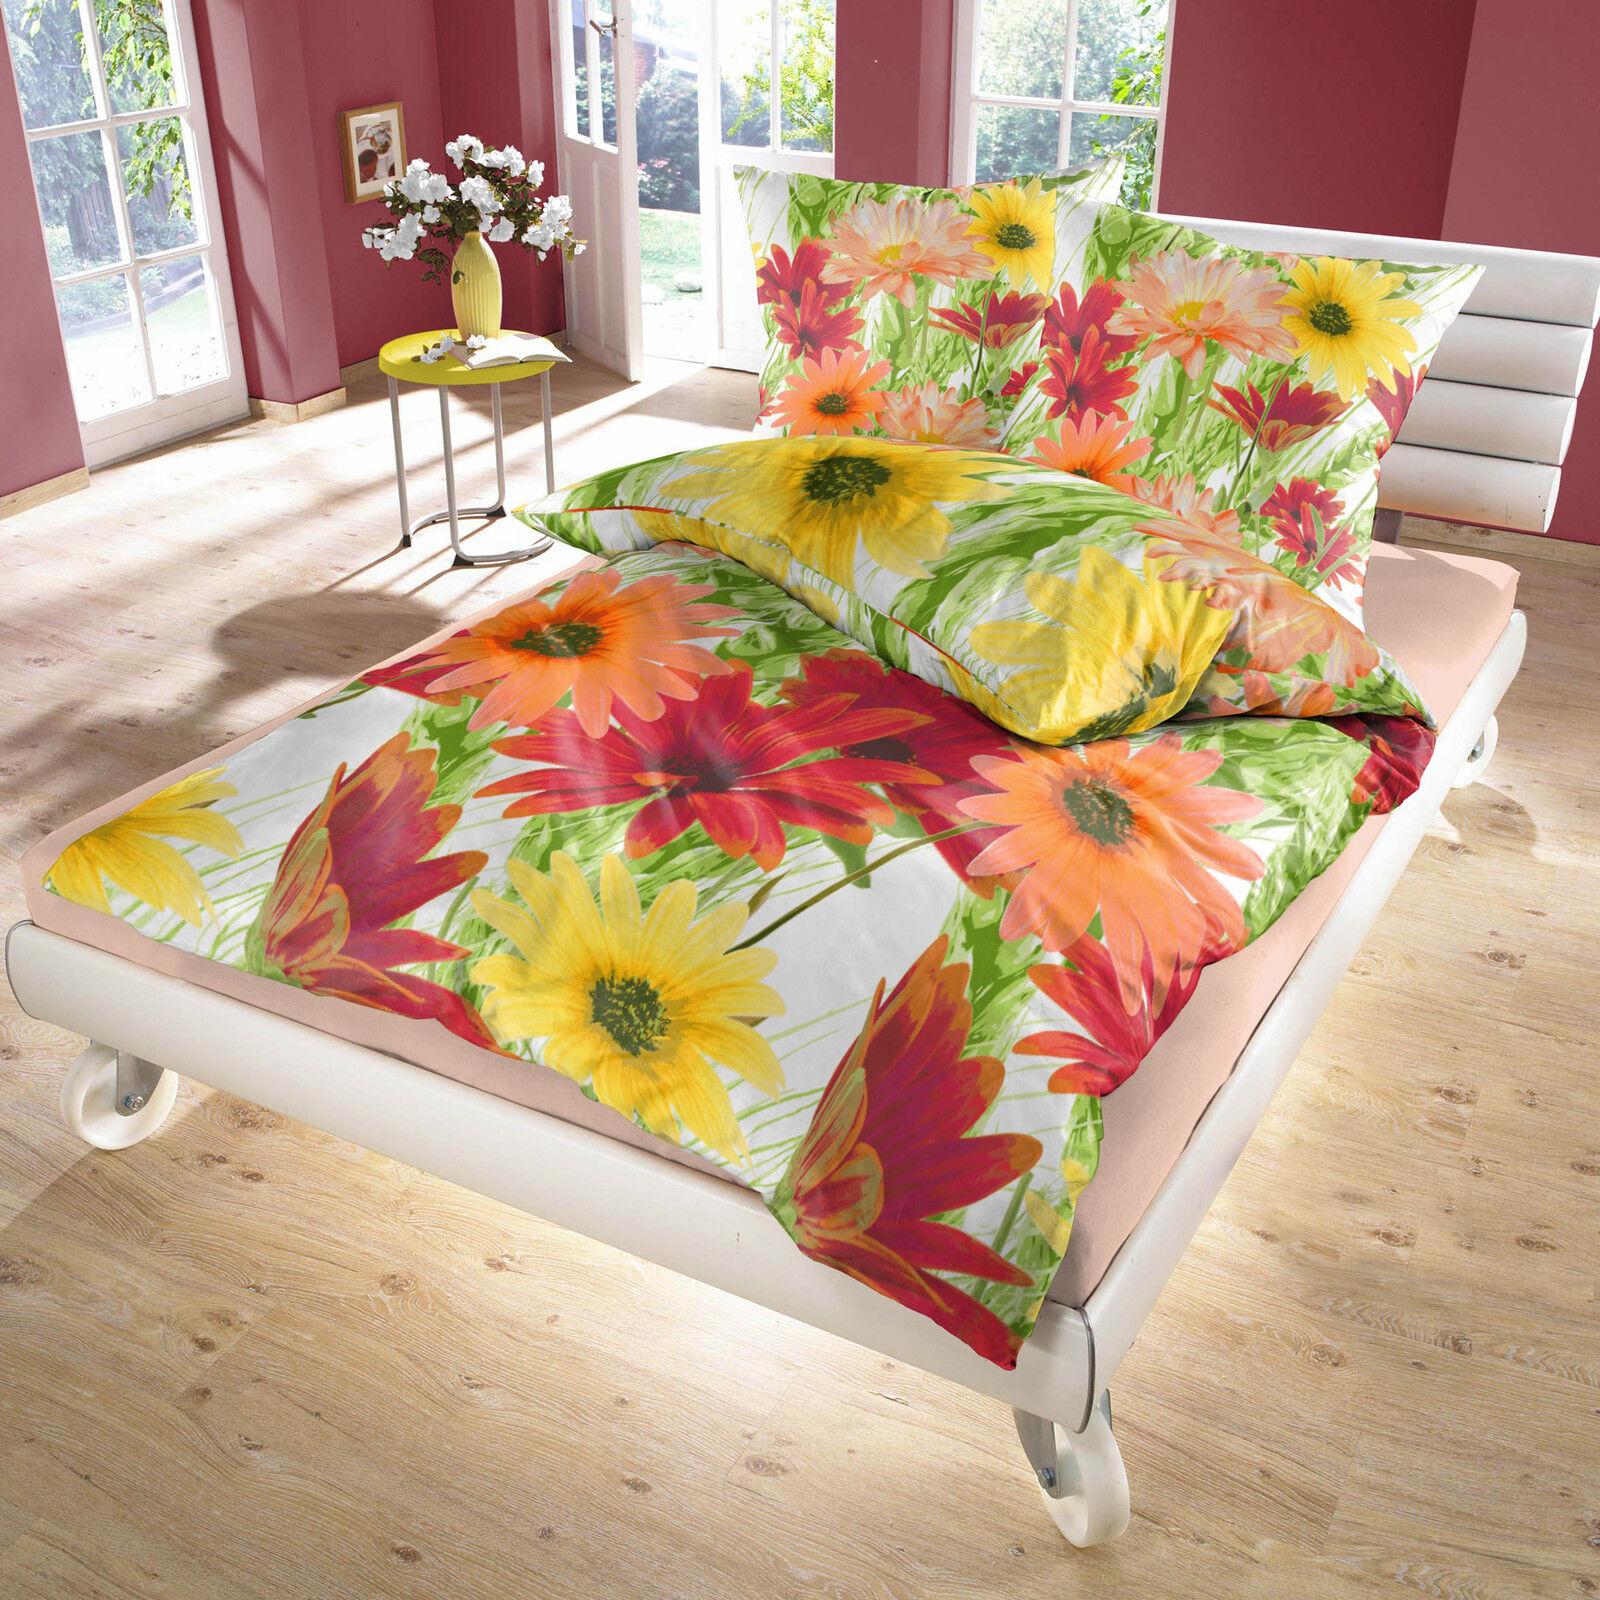 Lianne (Gerberas) - SoulBedroom 100% Cotton Bed Set (Duvet Cover & Pillow Cases)